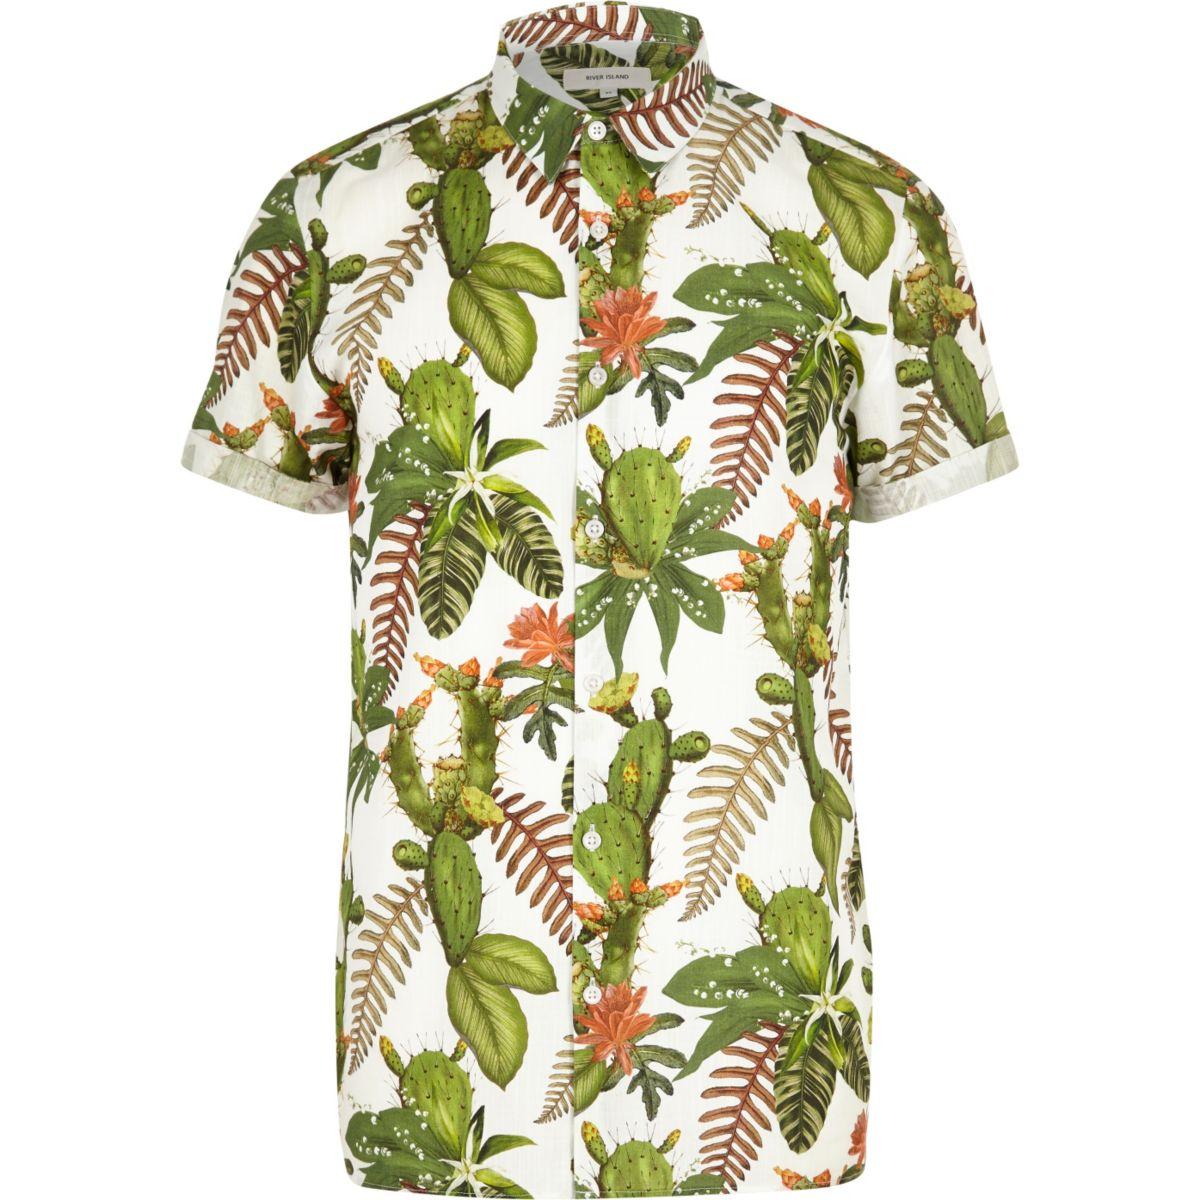 Green cactus flower print short sleeve shirt